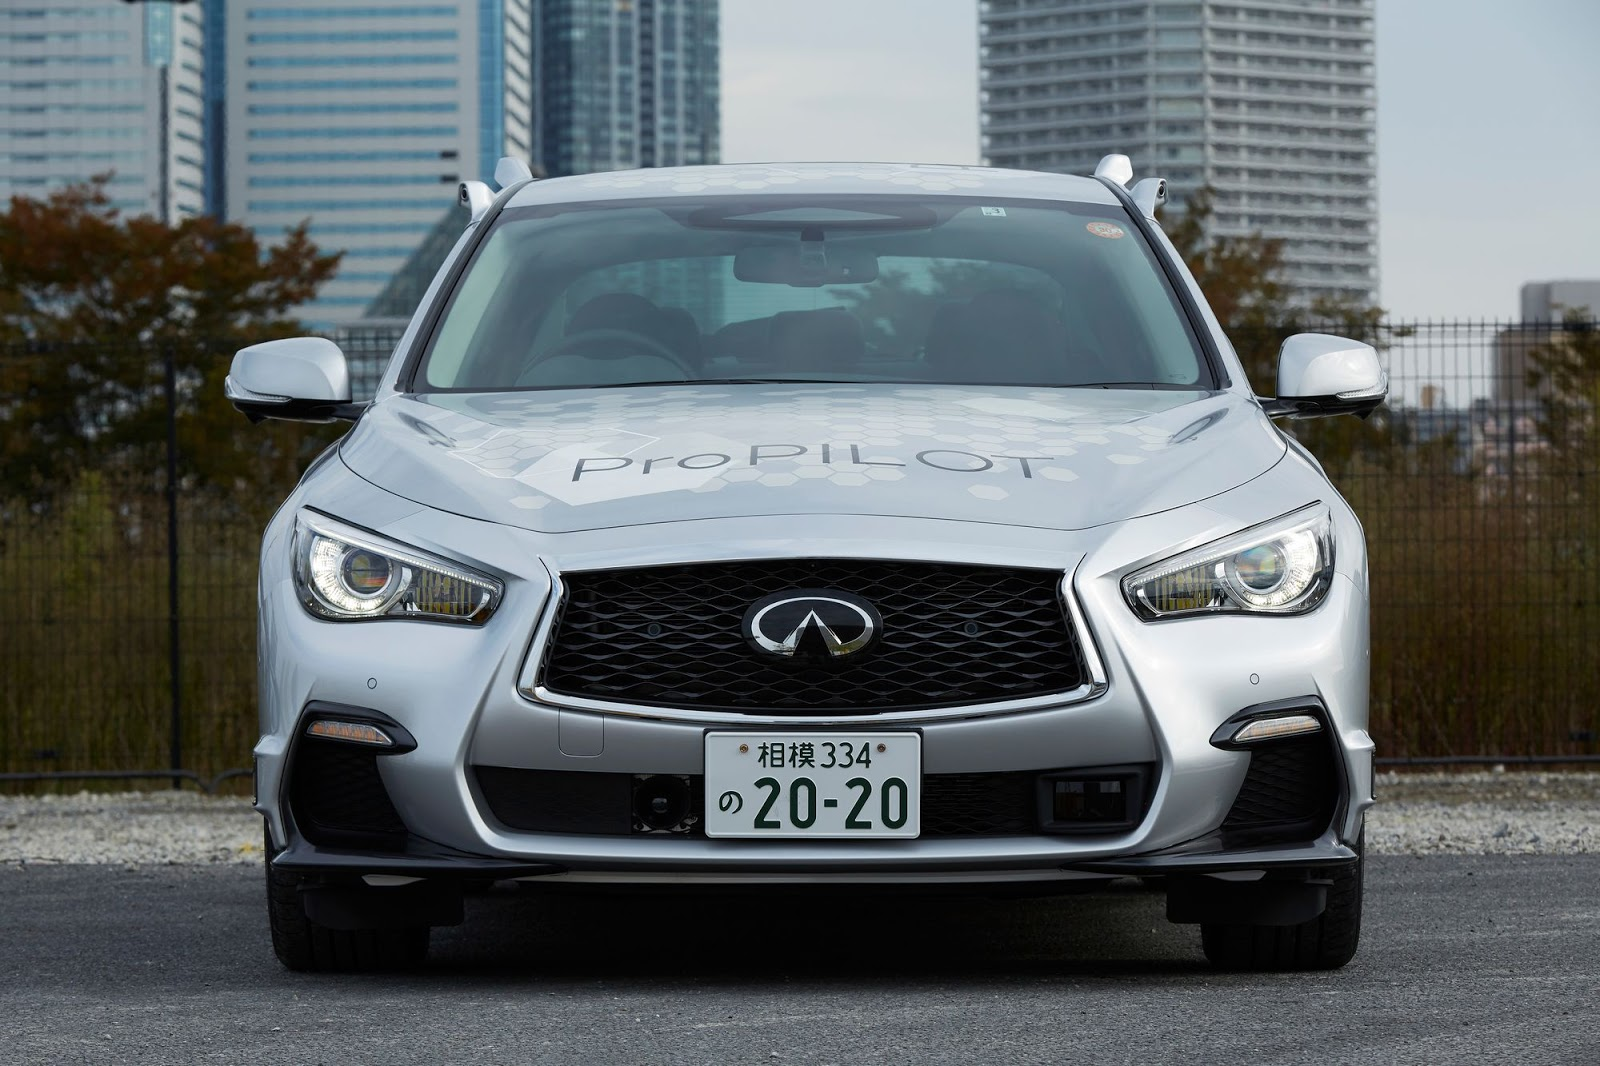 Nissan-Autonomous-Prototype-Tokyo-4